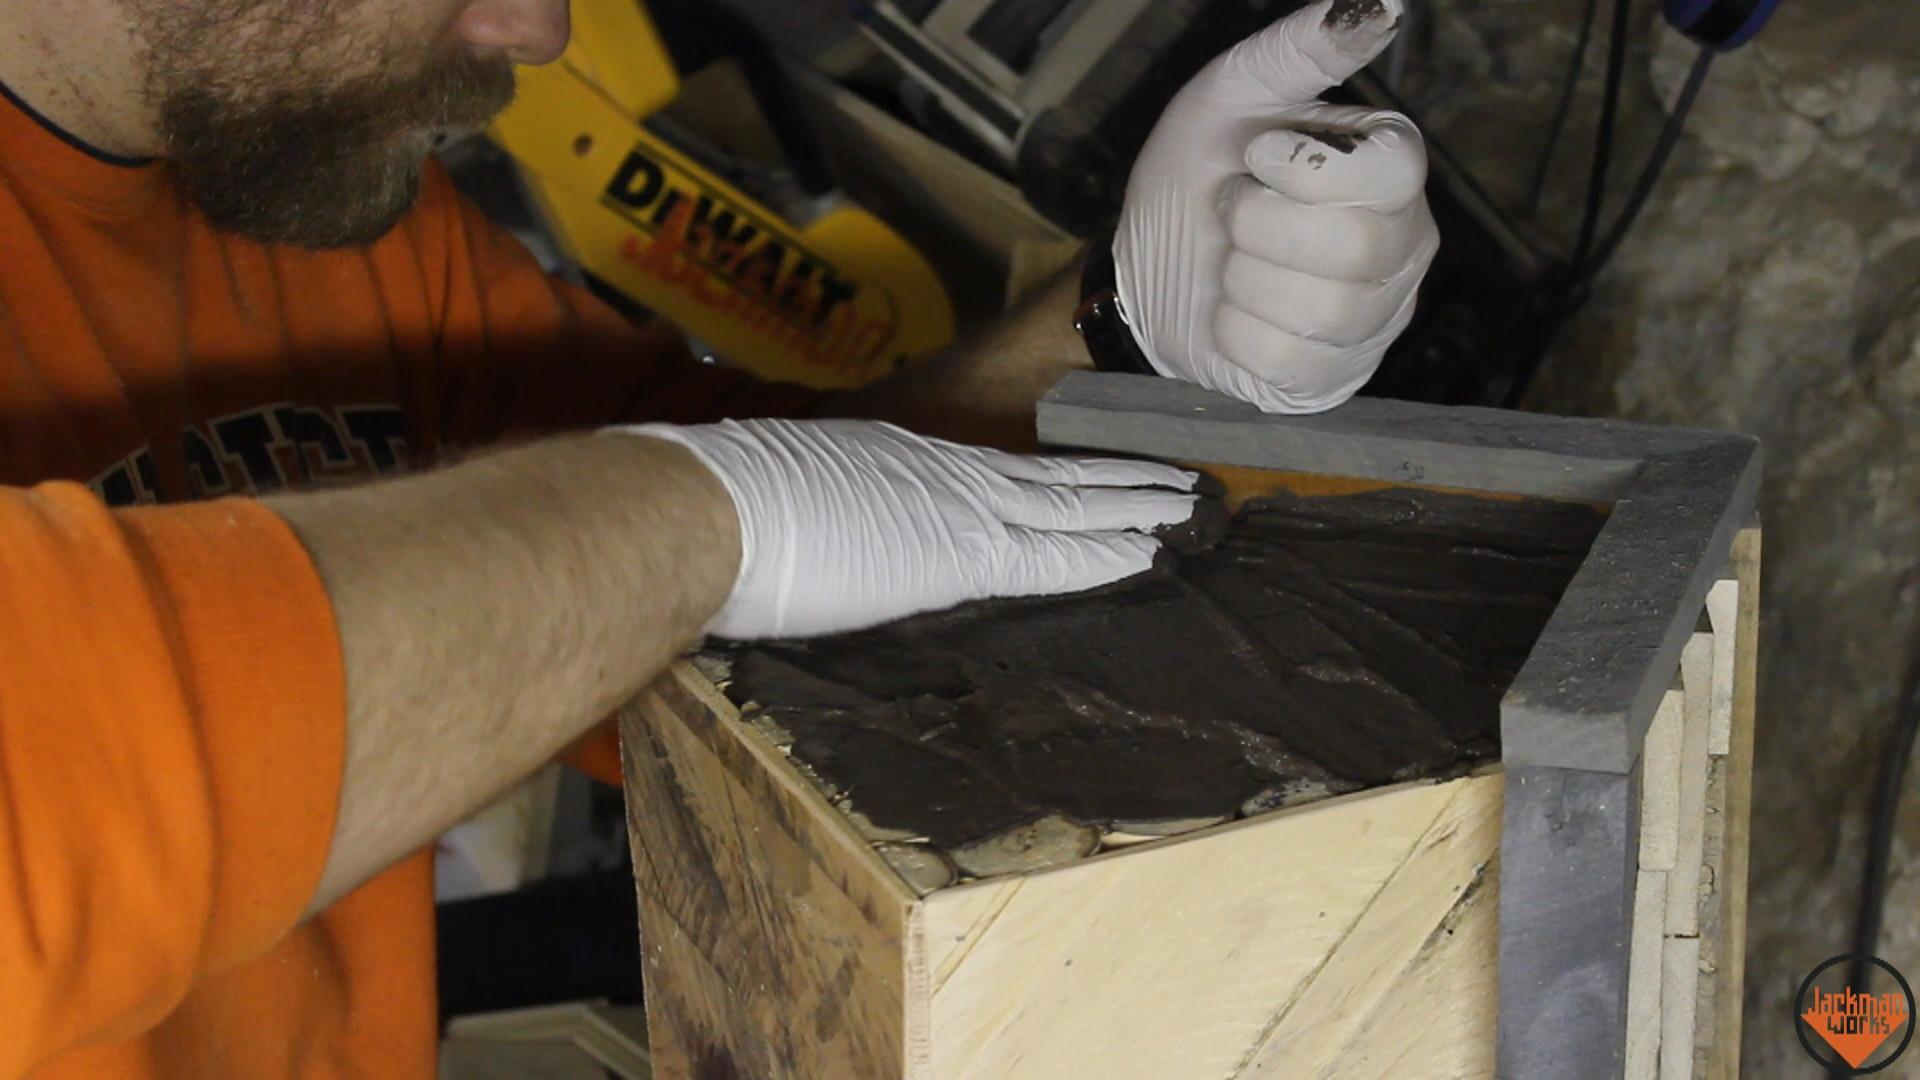 Wood mailbox 24 jackman works jackmanjackman worksjackman carpentrycarpentrywoodworkingwooddiydo it yourselfbuildingmakingdesignupcycledrecycledreclaimedhow to make a solutioingenieria Image collections